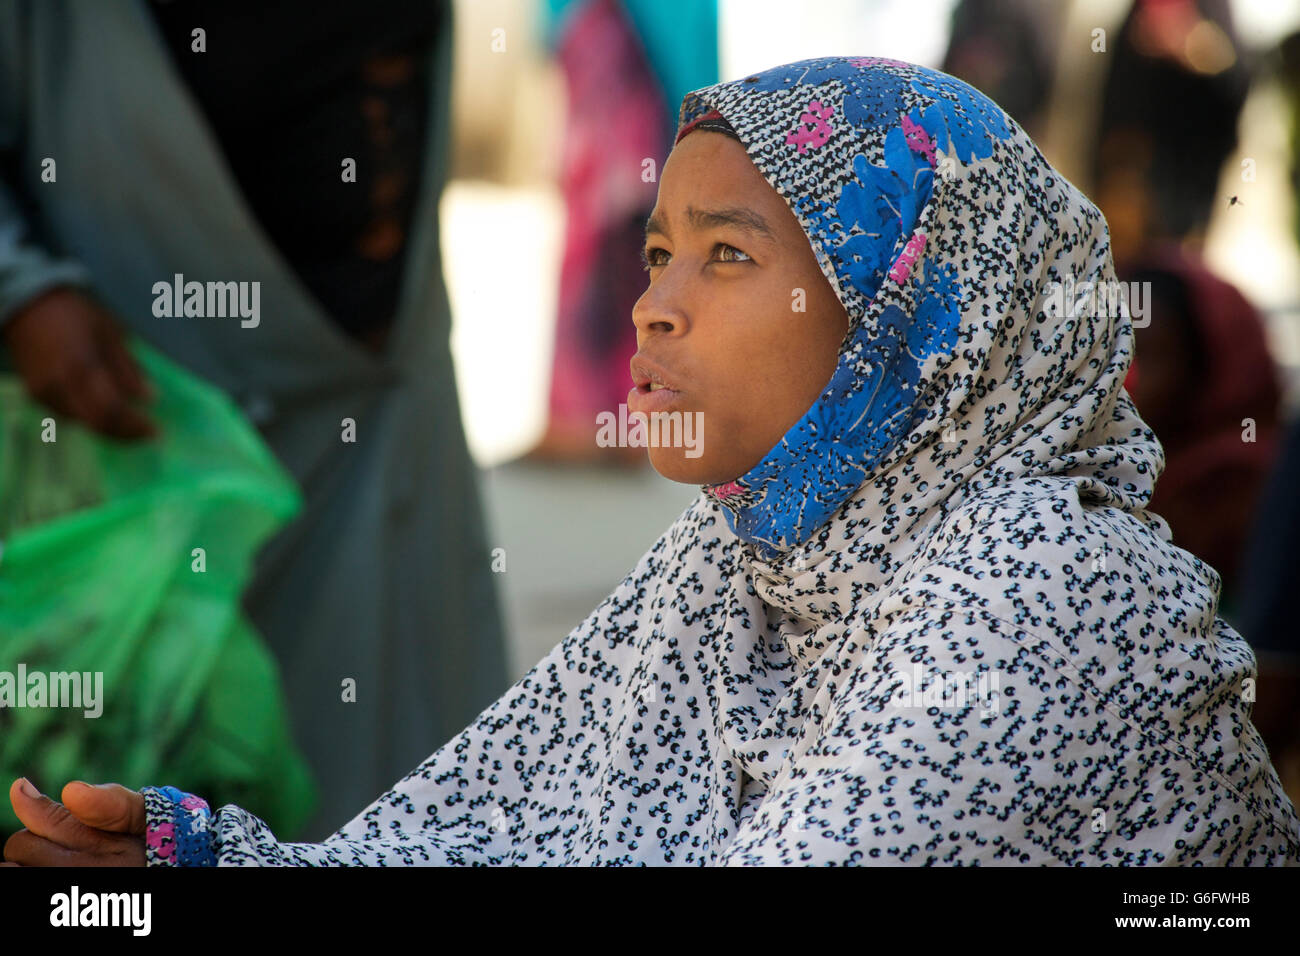 Harari woman in muslim dress. Headcloth. Harar, Ethiopia - Stock Image